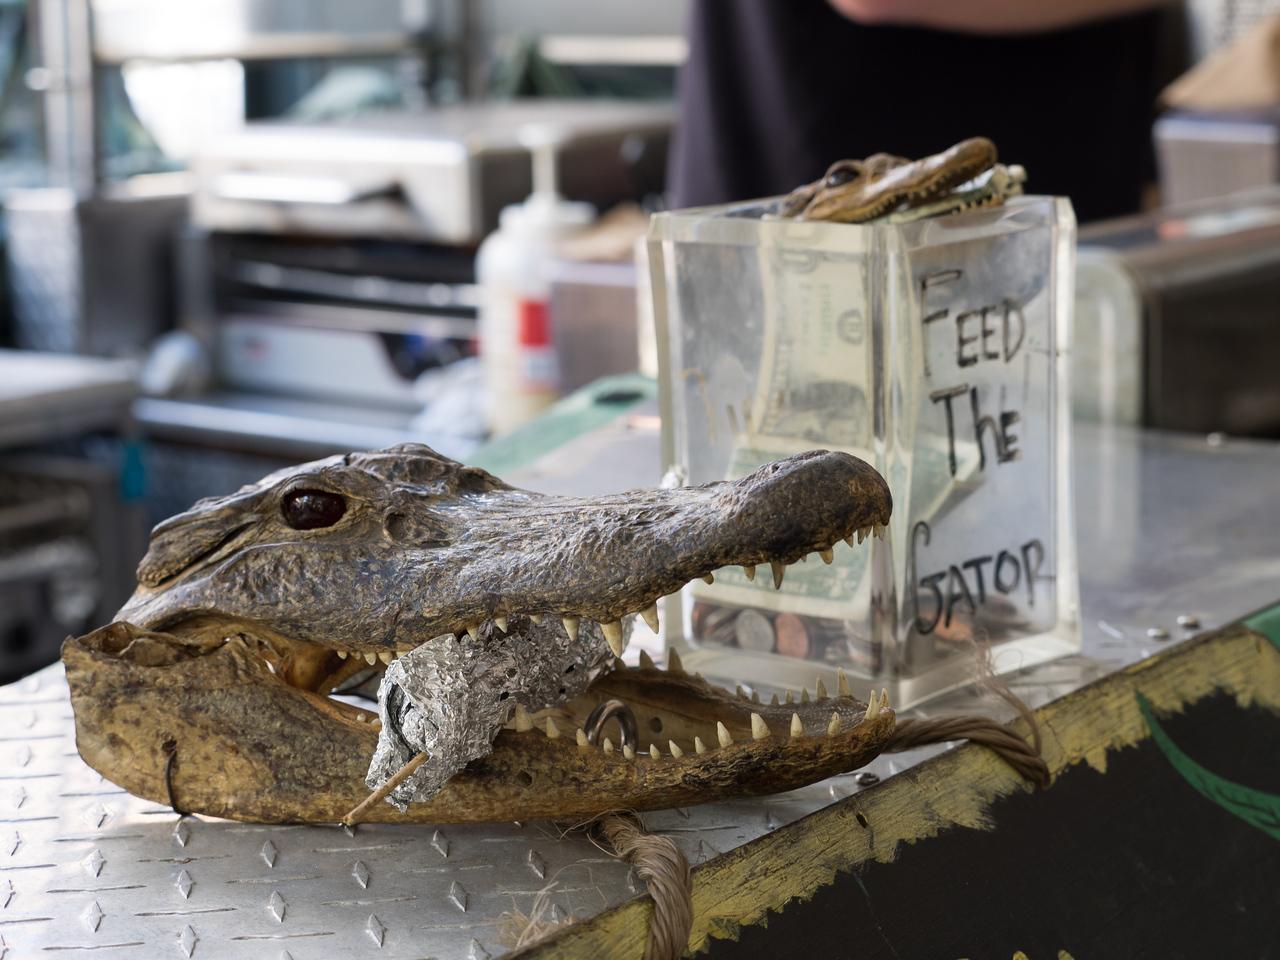 Feed the Gator